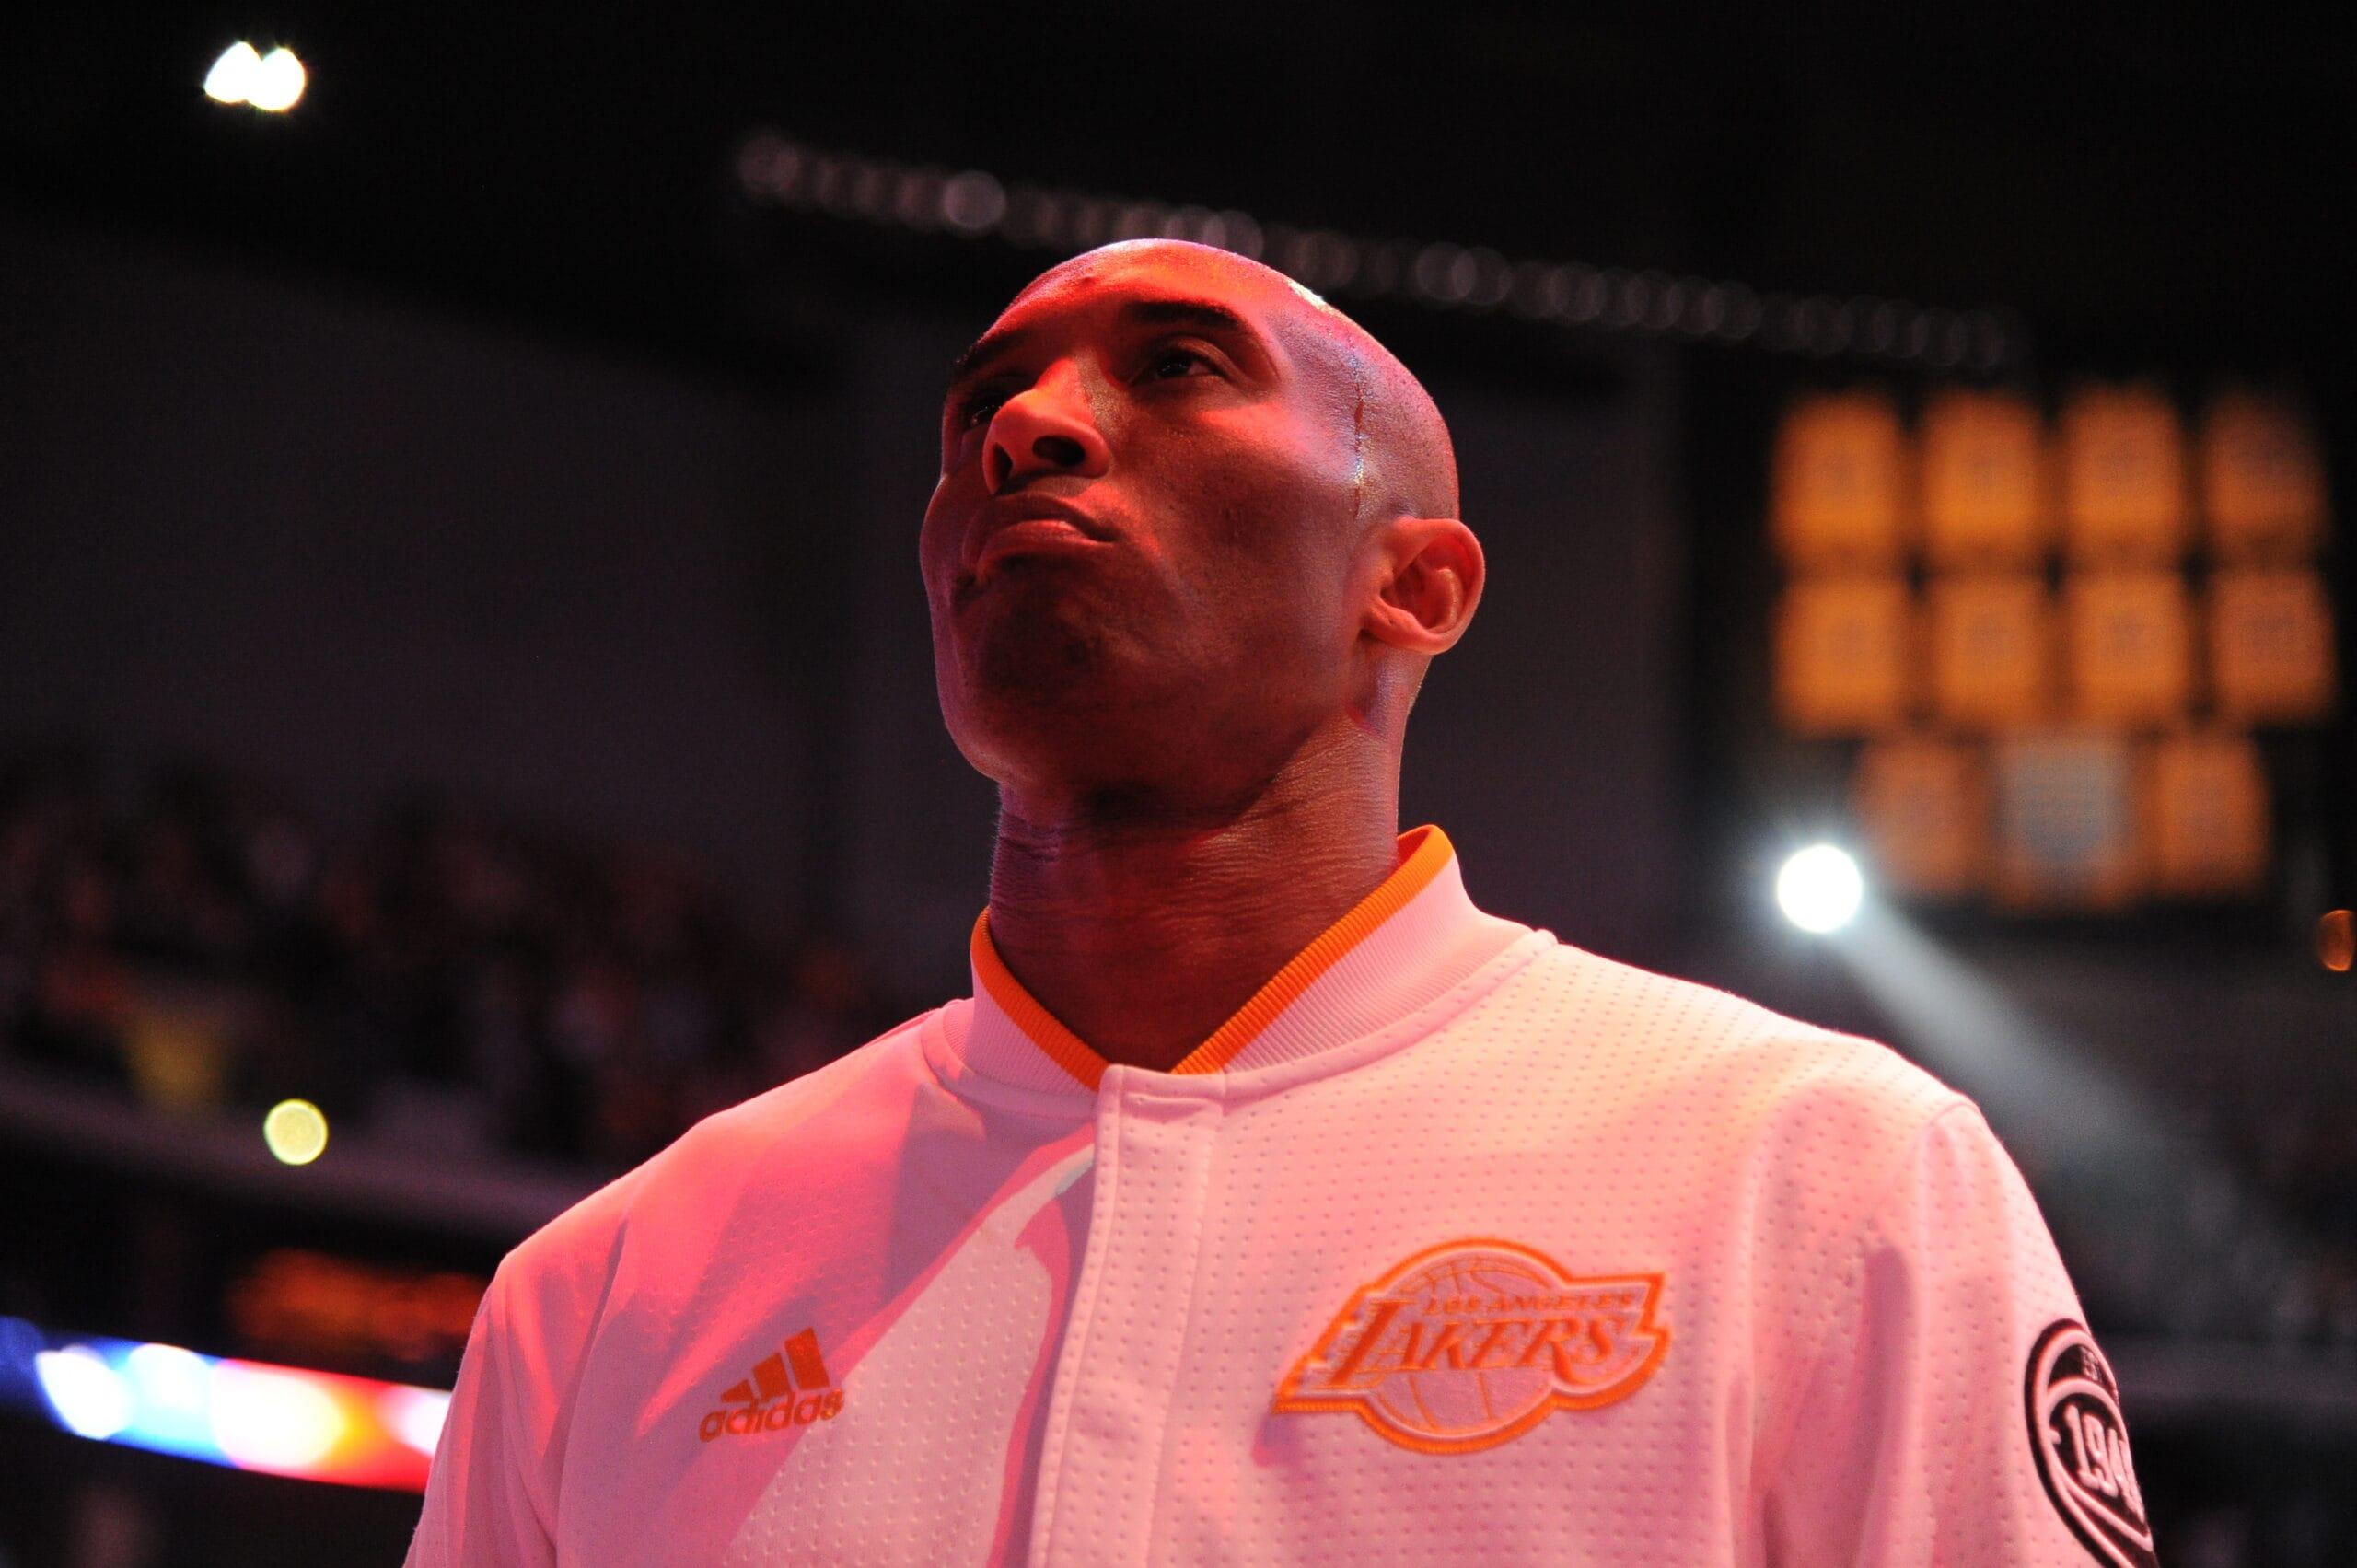 Kobe Bryant: 10 things to know